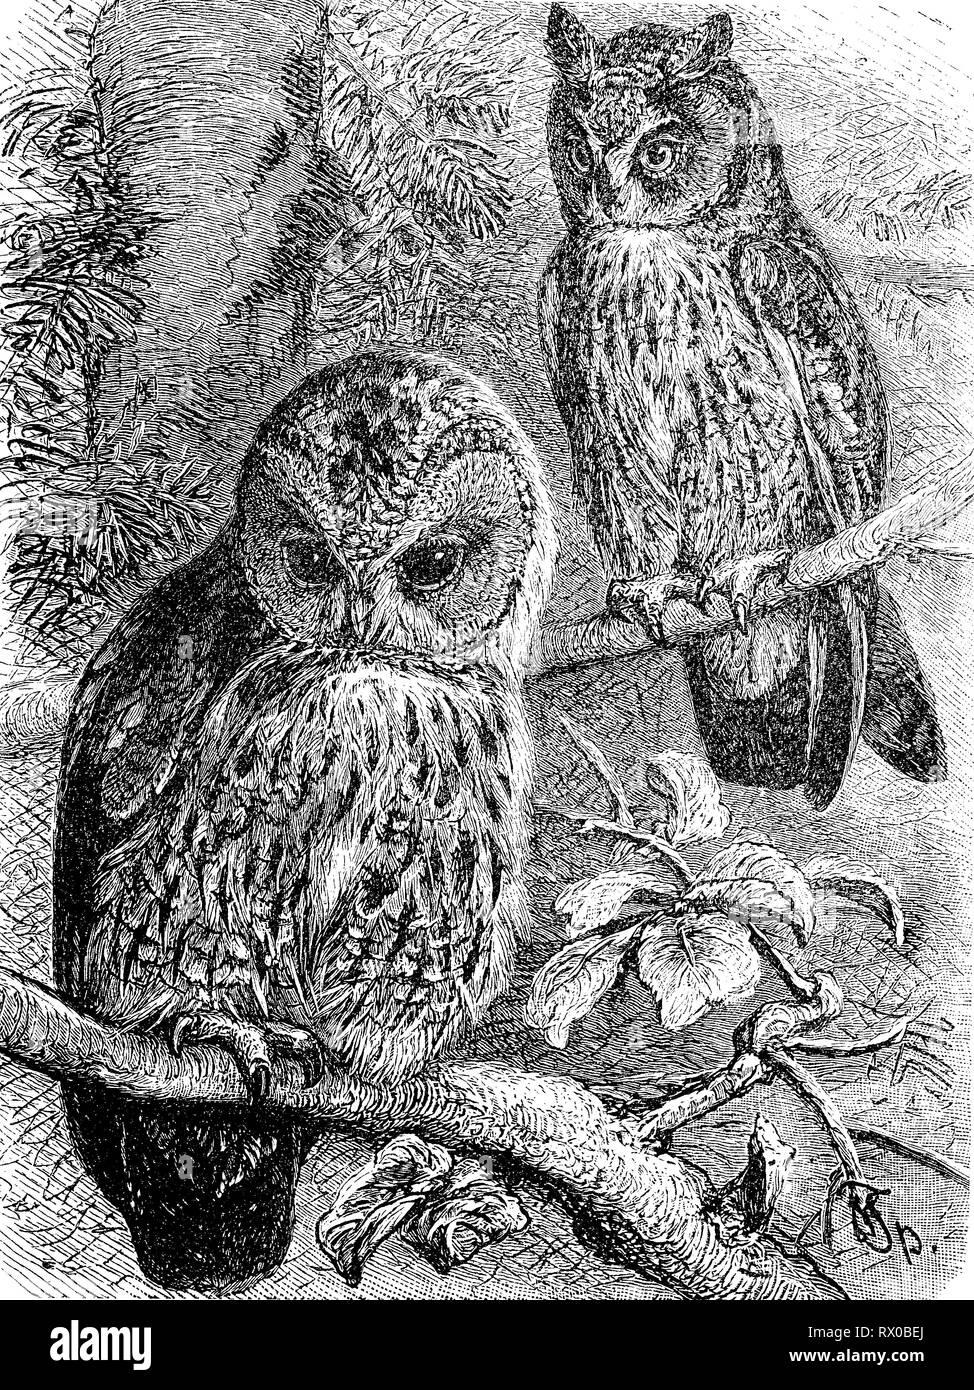 Waldkauz, Strix aluco und Waldohreule, Asio otus / tawny owl or brown owl, Strix aluco and long-eared owl, Asio otus Stock Photo